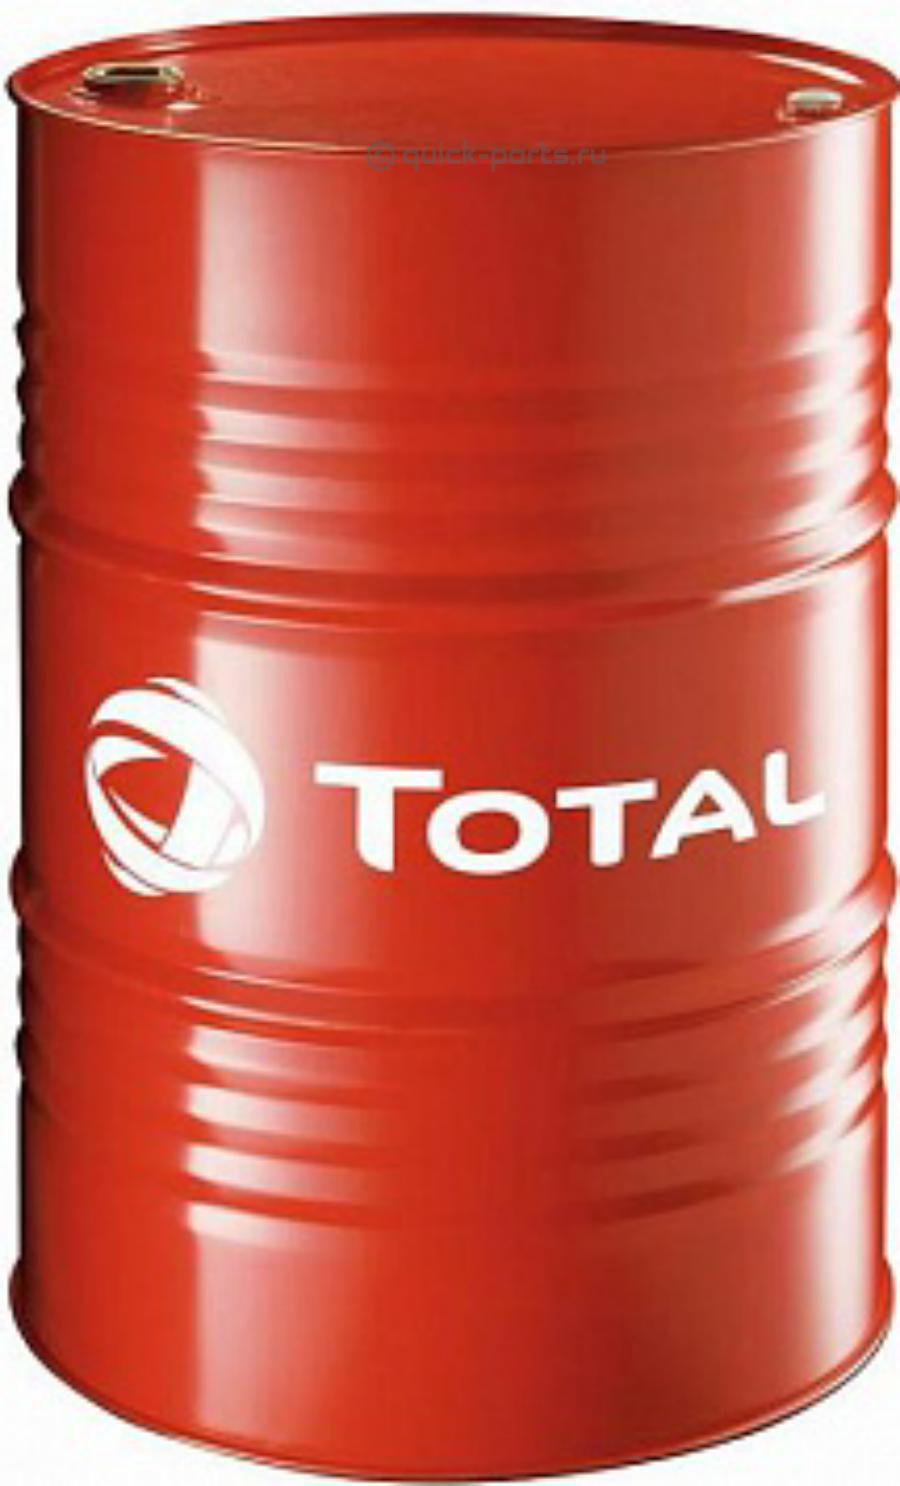 TOTAL Transmission Gear 8 FE 75W-80